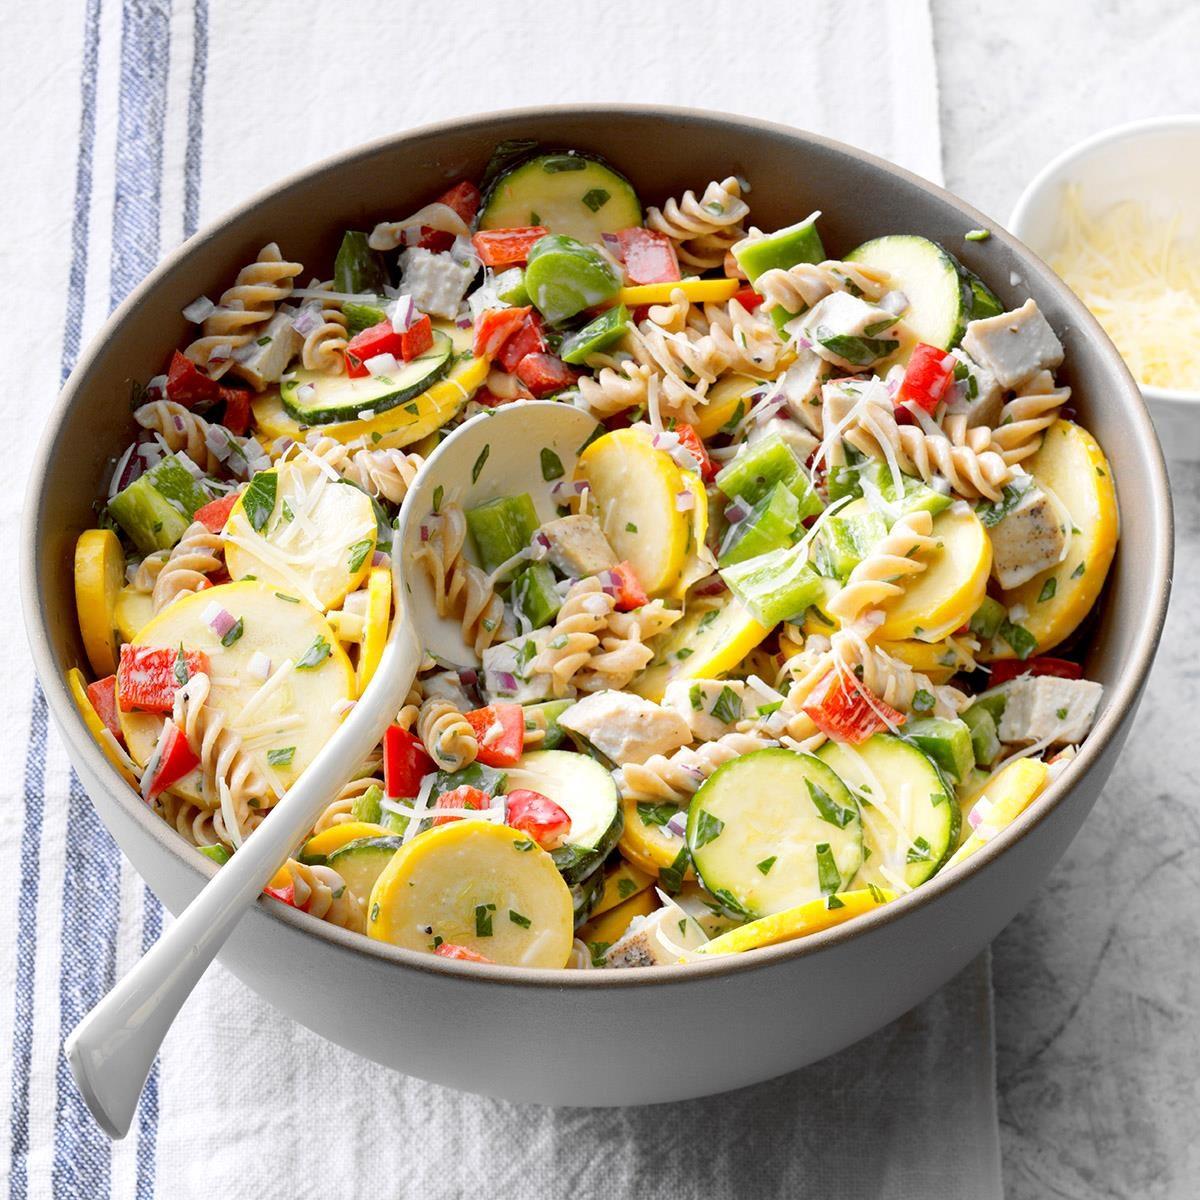 Turkey and Pasta Ranch Salad